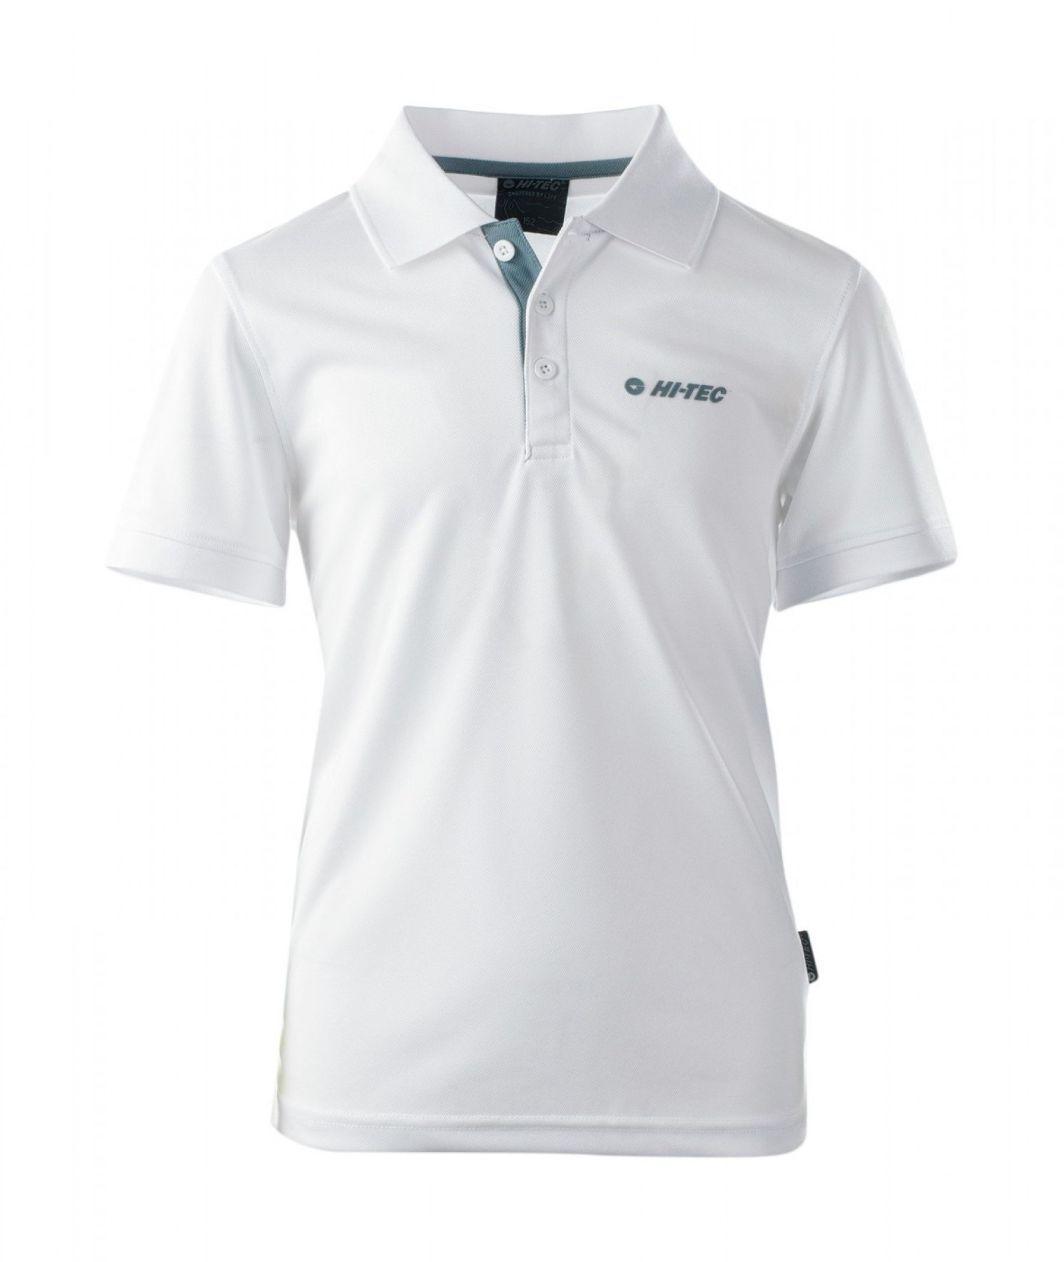 Hi-tec Koszulka dziecięca SITE JR WHITE/TROOPER r. 146 cm (92800081675) 1